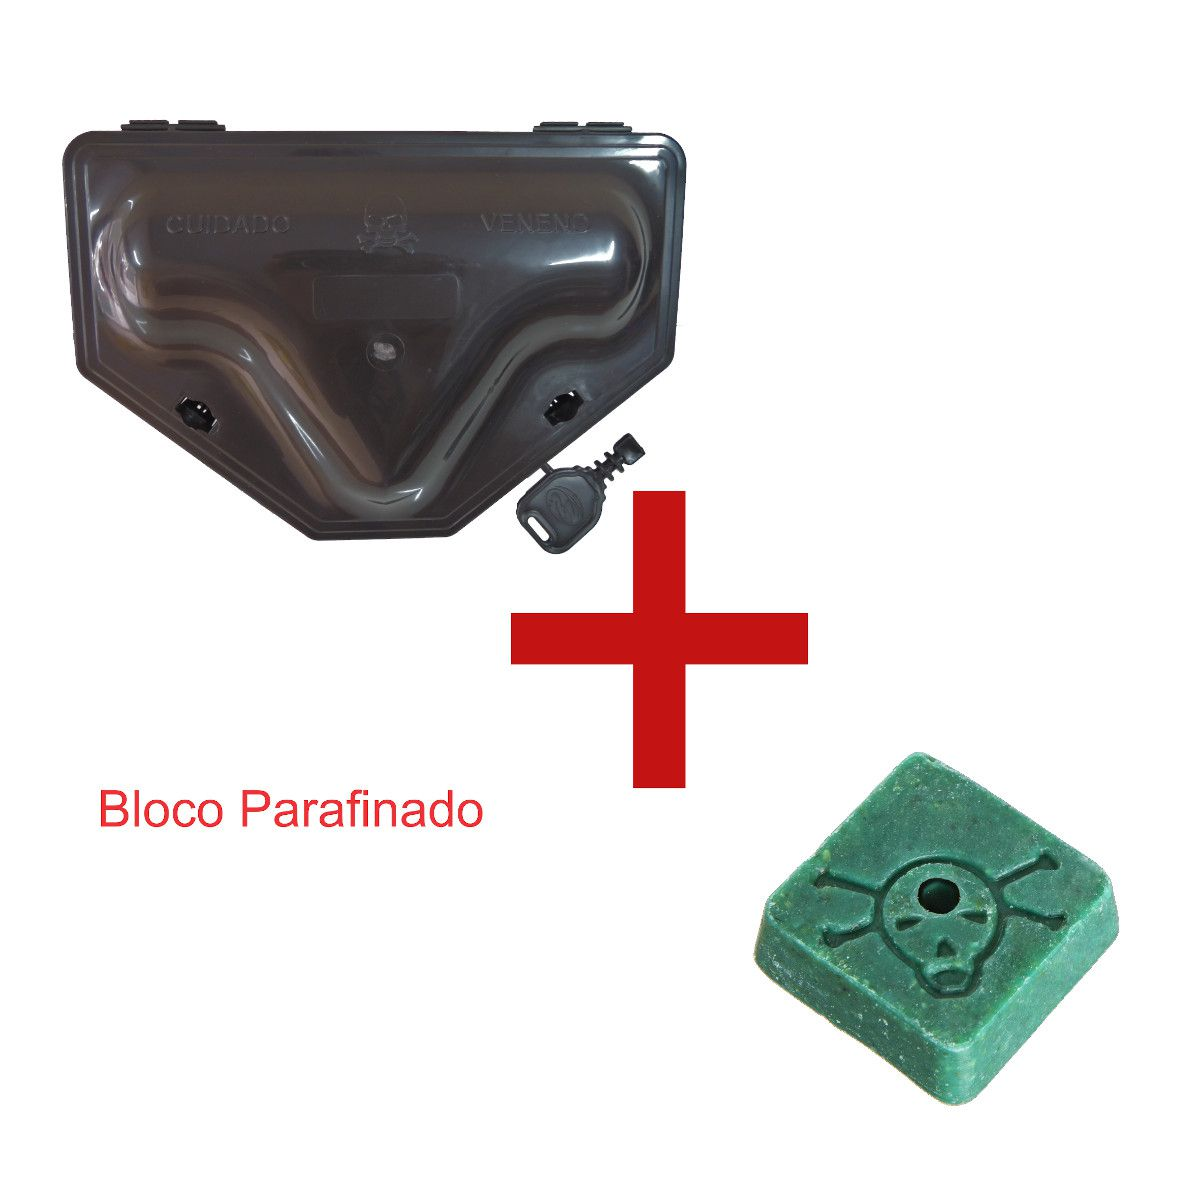 KIT 30 Armadilha p/Ratos Porta Iscas 2 TRAVAS Chave Ratoeira